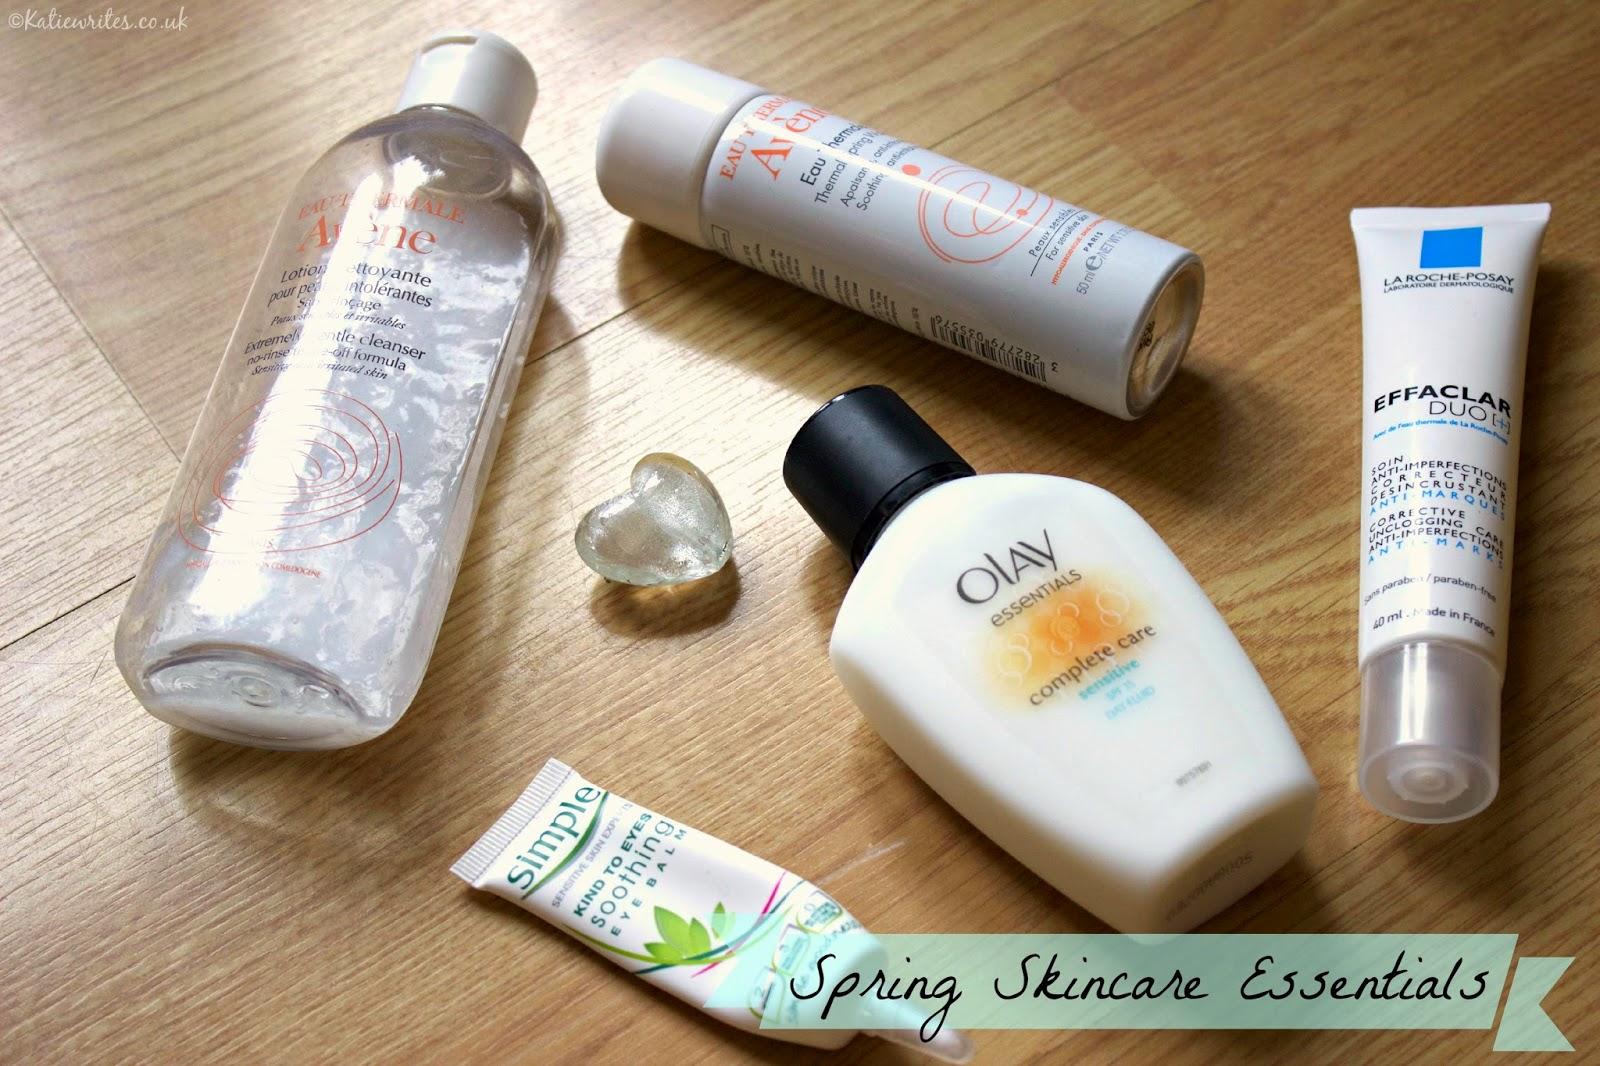 Spring Skincare Essentials (for Sensitive Skin)